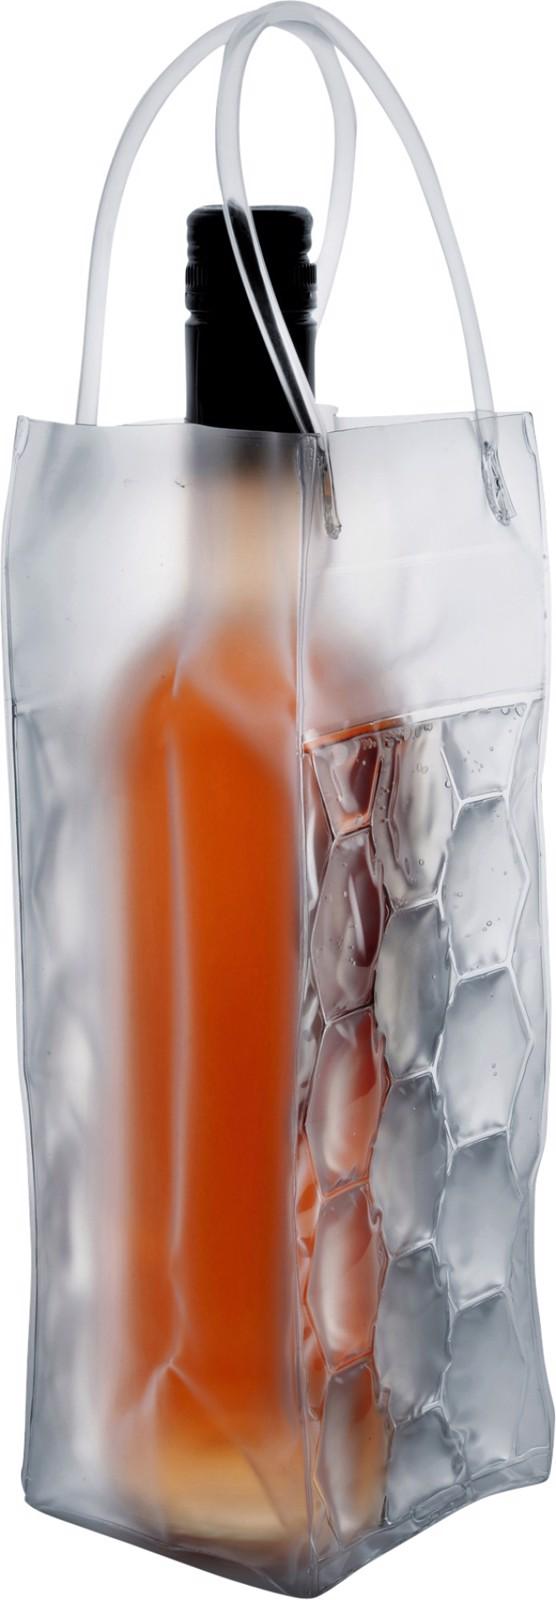 PVC cooler bag